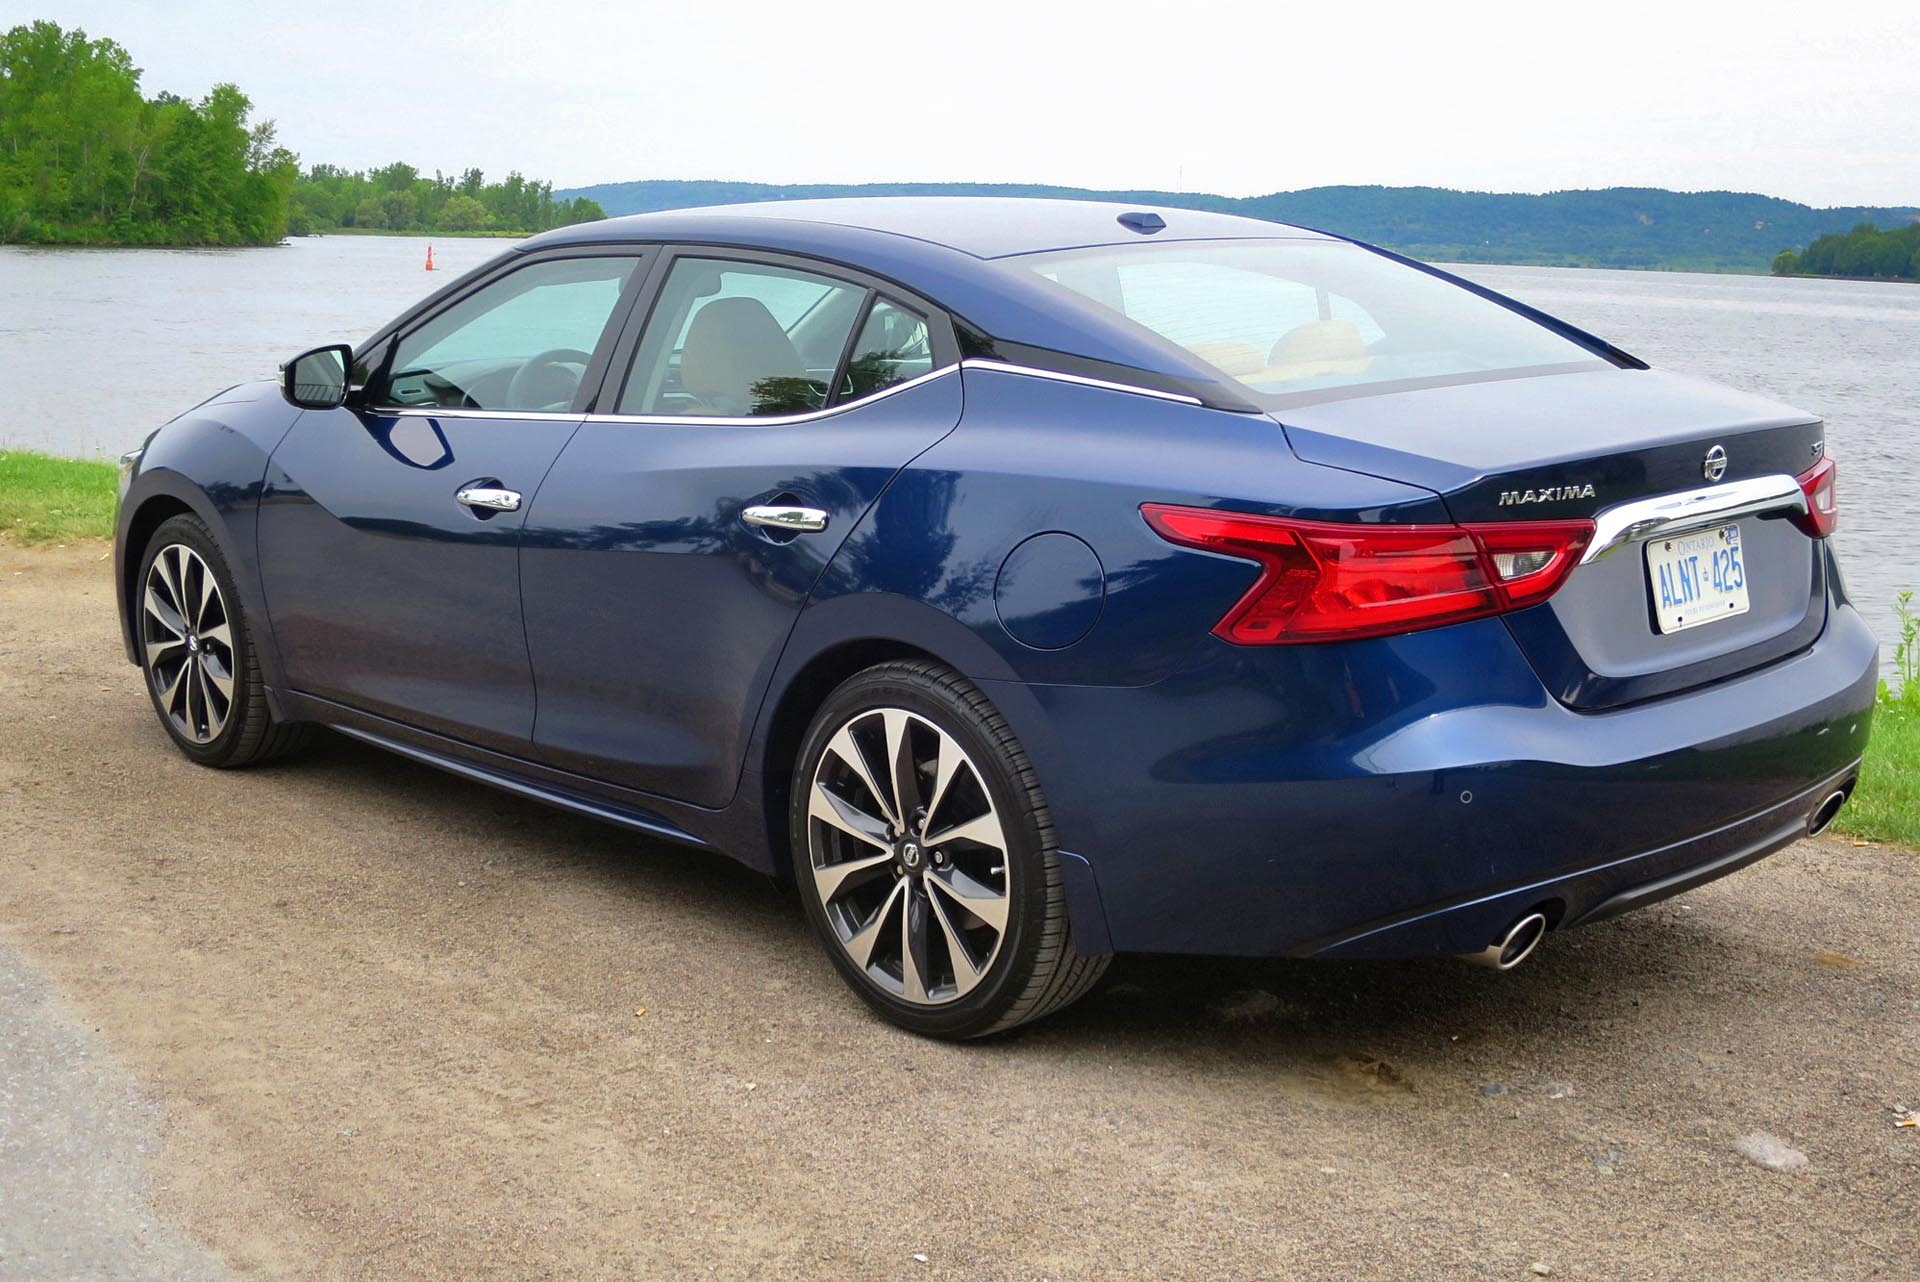 http://www.autos.ca/wp-content/uploads/2015/07/2016-Nissan-Maxima-SR-PW-04.jpg